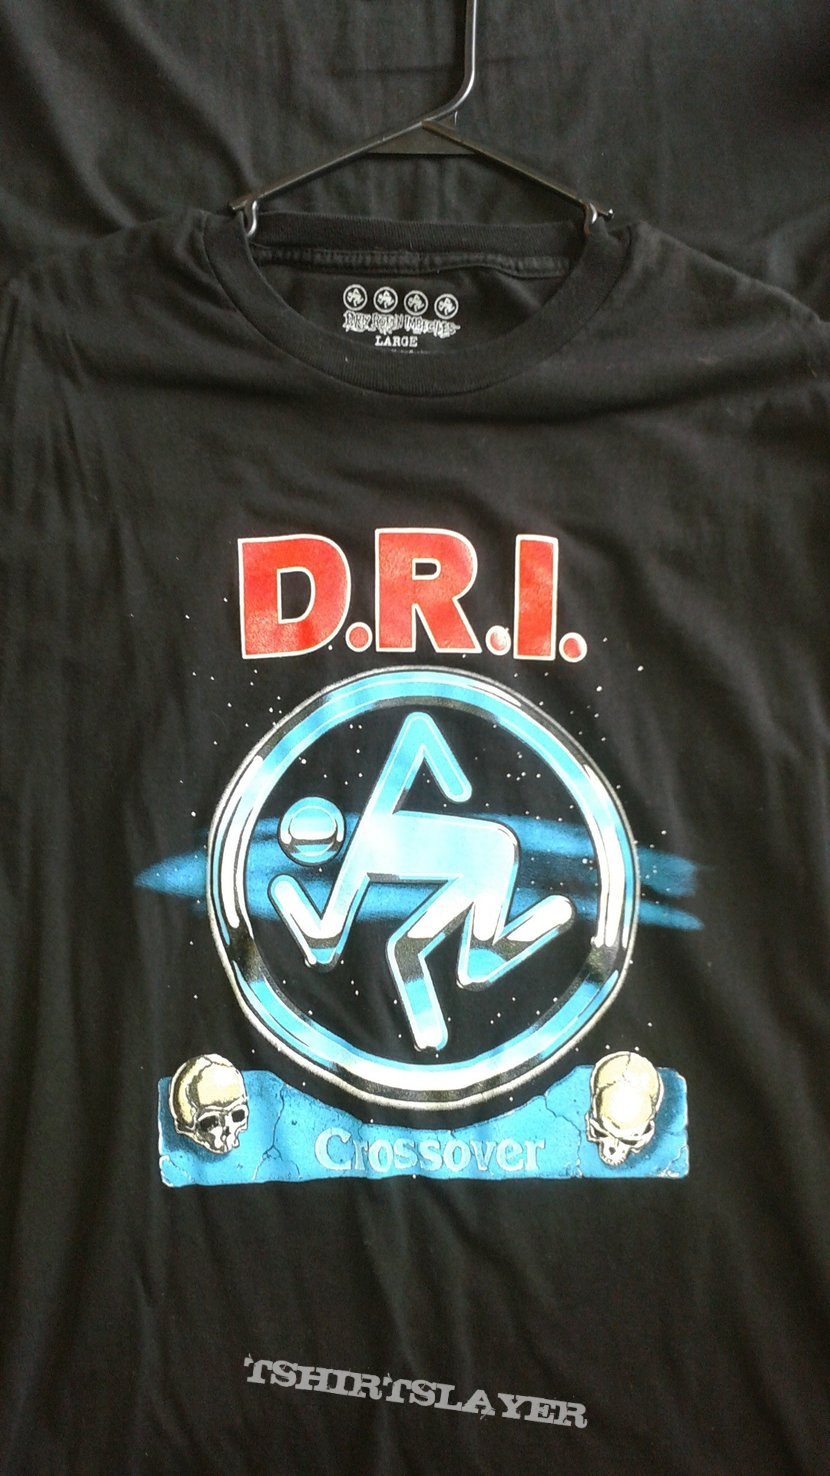 D.R.I. Crossover T-shirt.